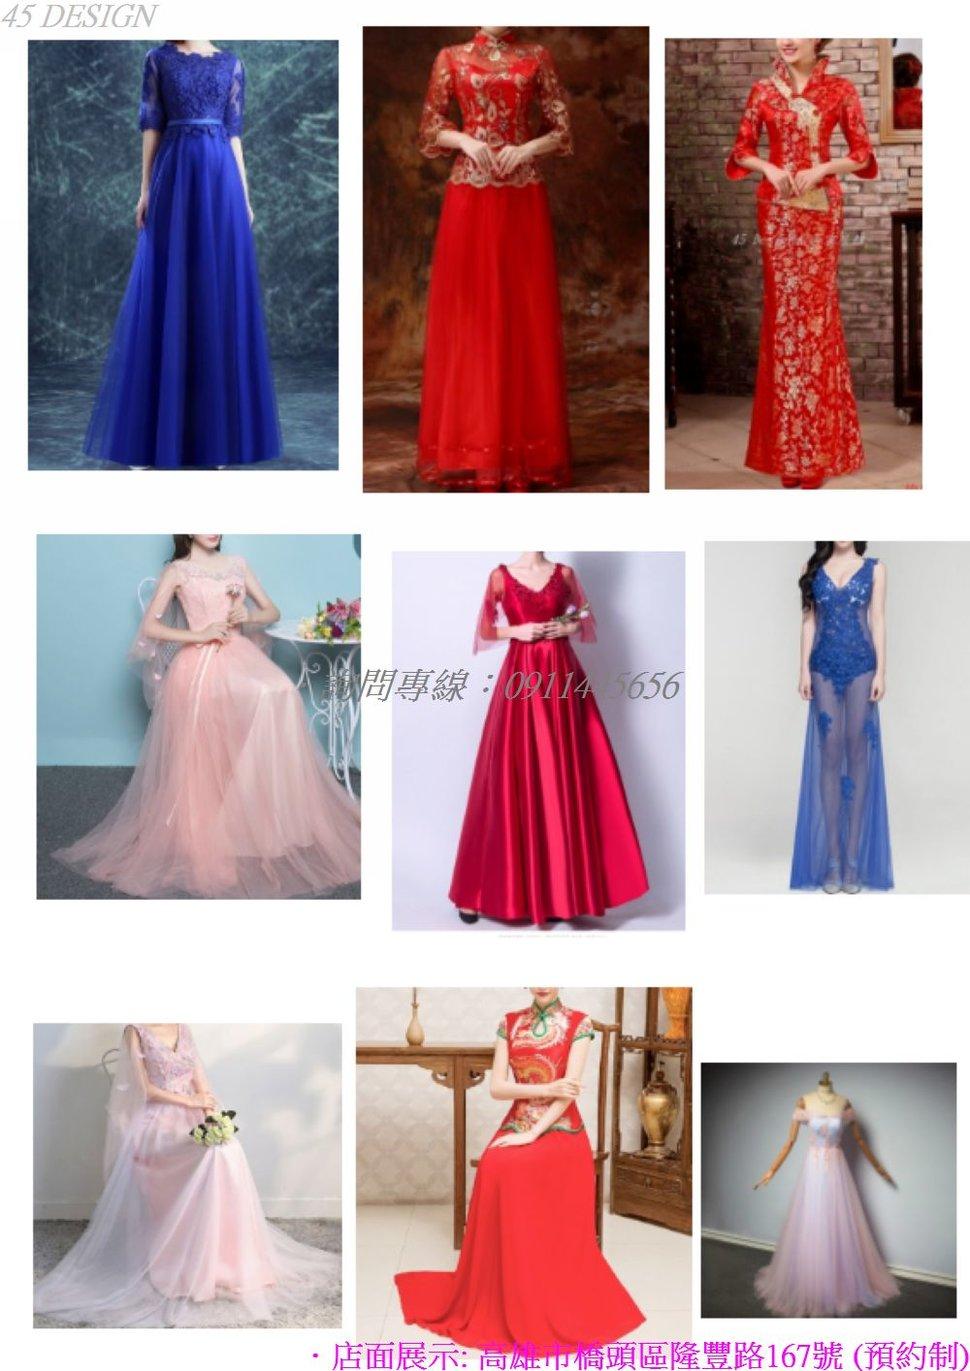 msl190815ABEEB2706A1842098205E8BC7F889CAB - 全台最便宜-45DESIGN四五婚紗禮服《結婚吧》